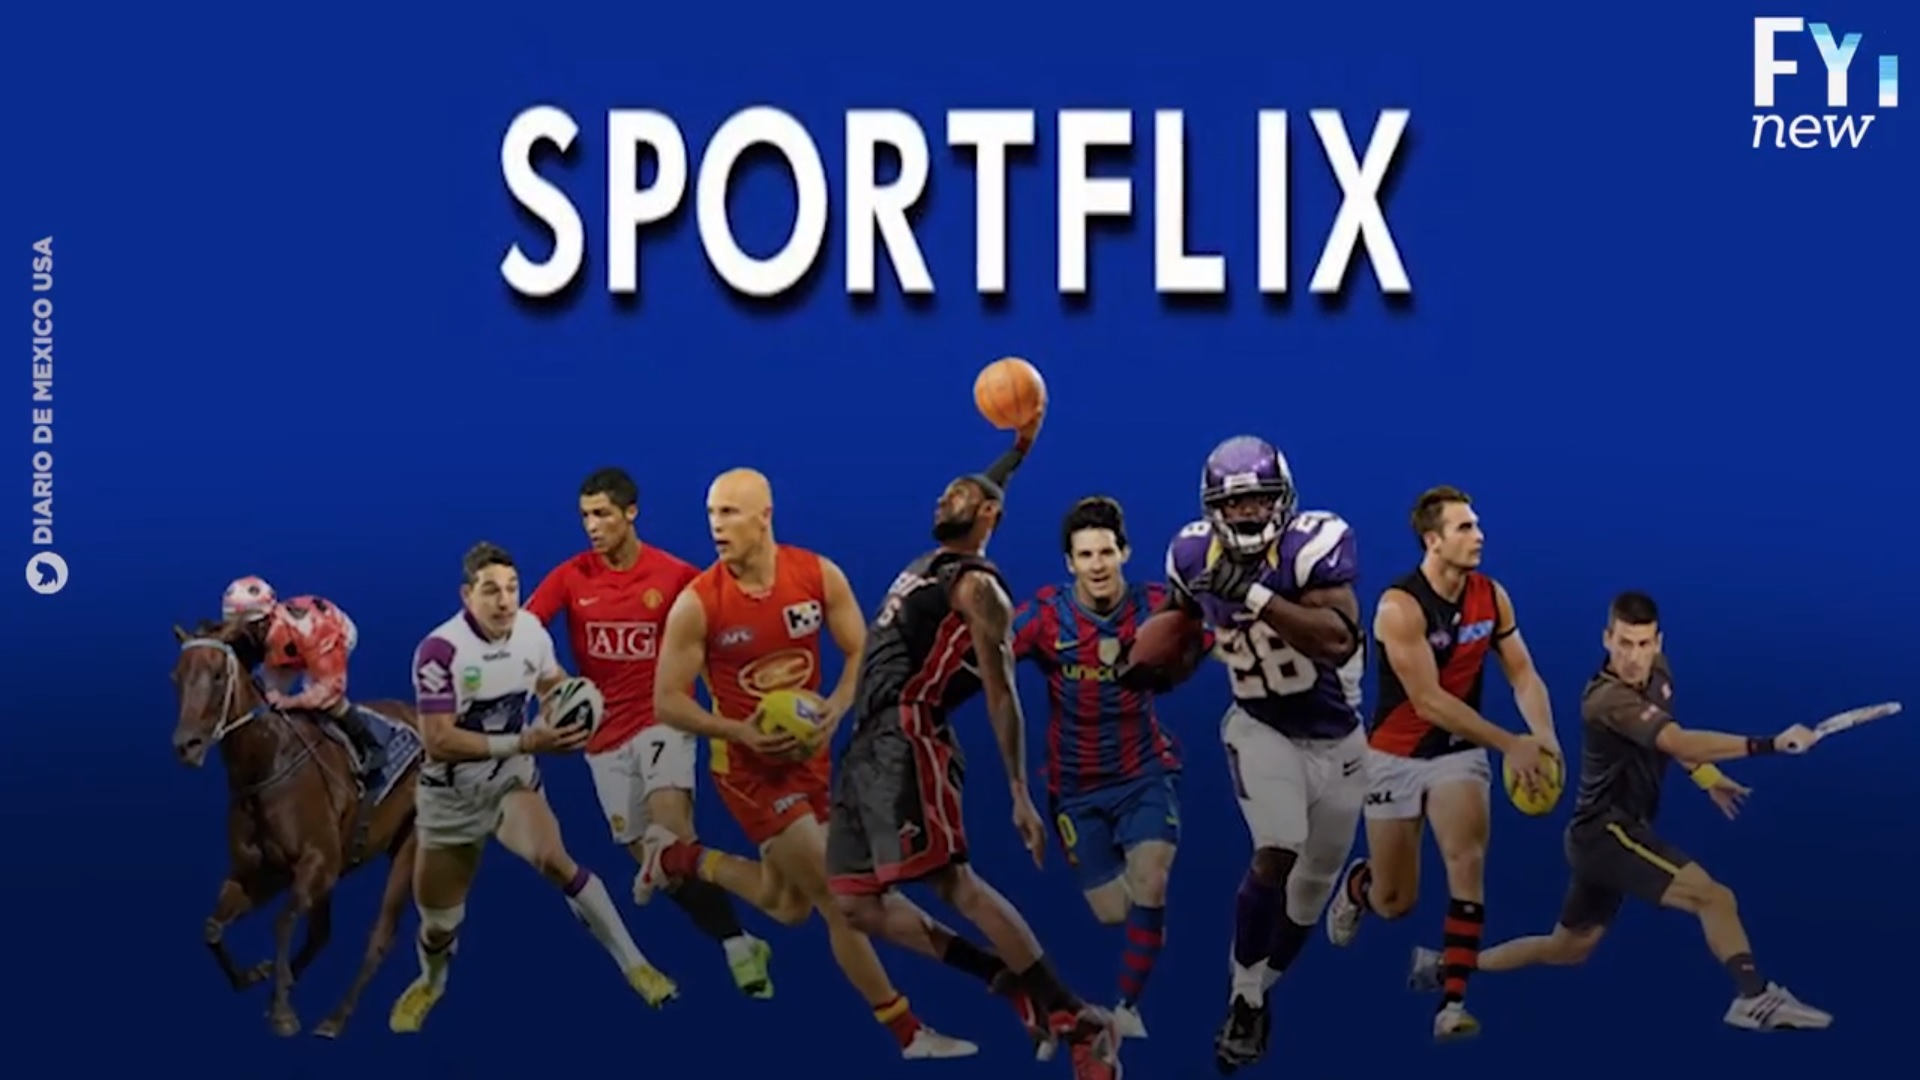 Imagen: Sportflix